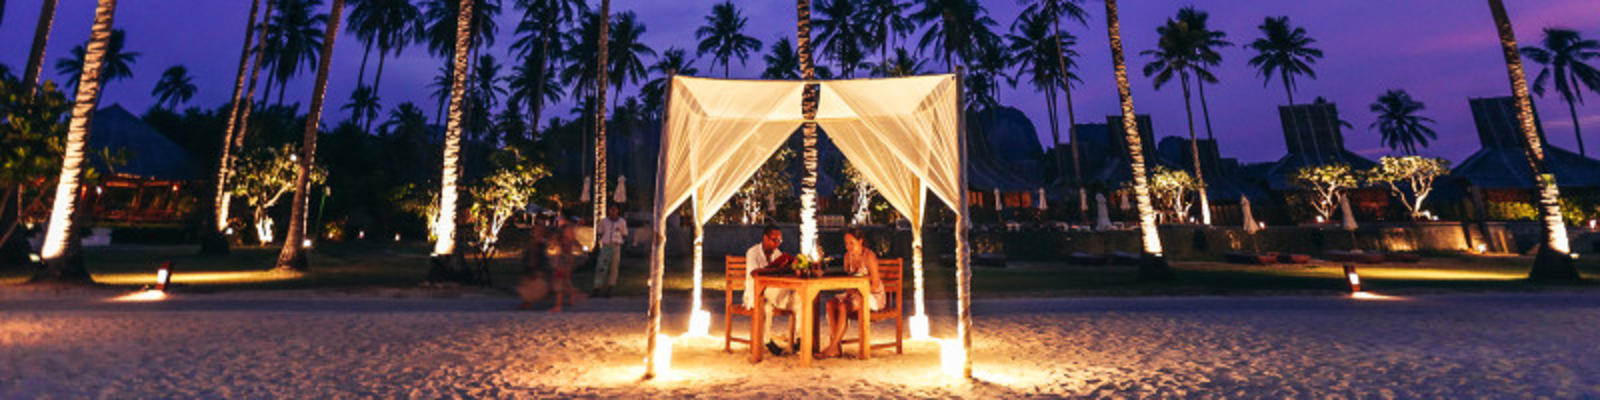 Thailand's most romantic restaurants